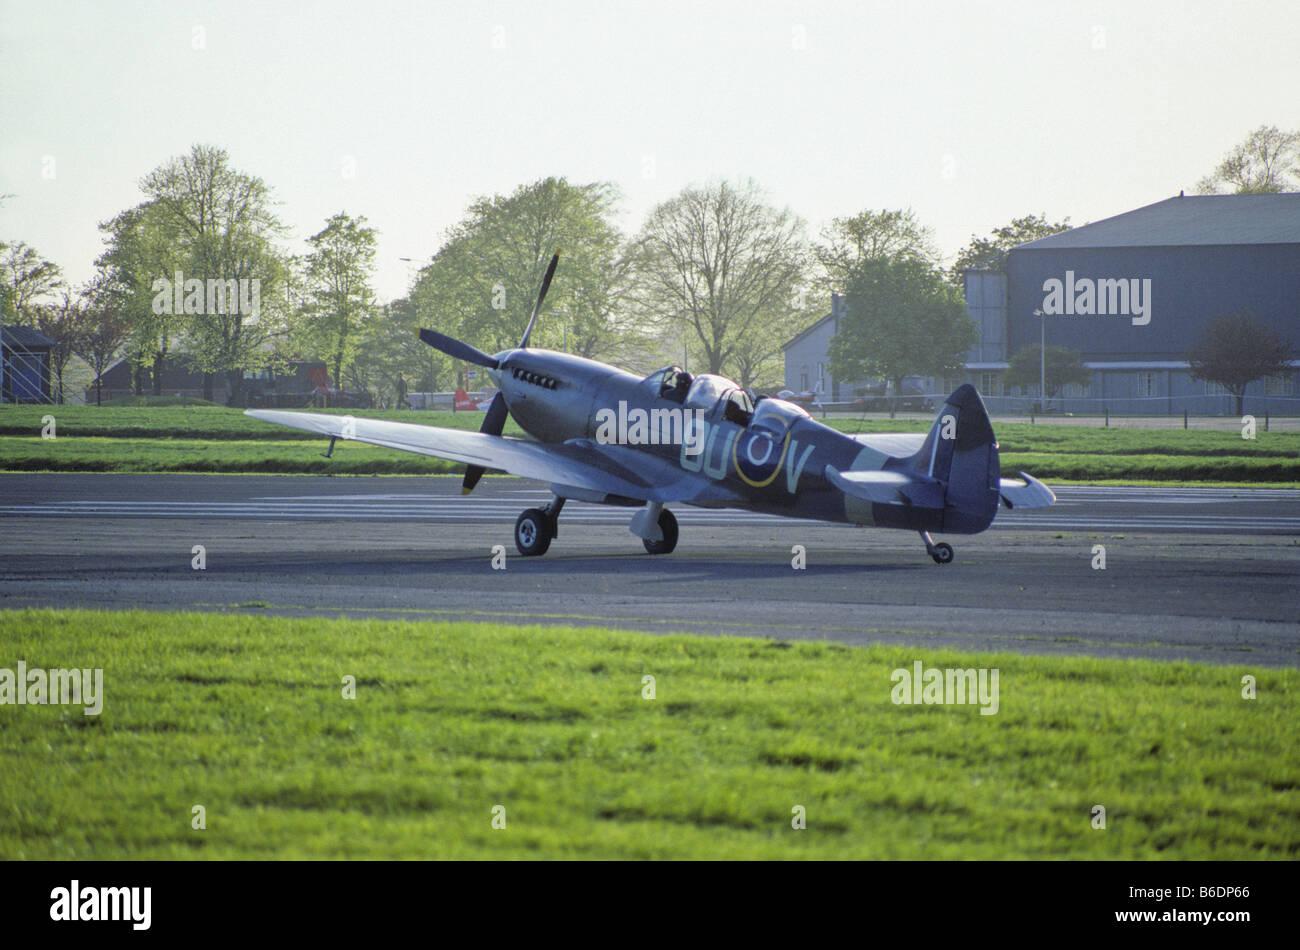 Super Marine Spitfire Tr 9 at Biggin Hill Airfield - Stock Image